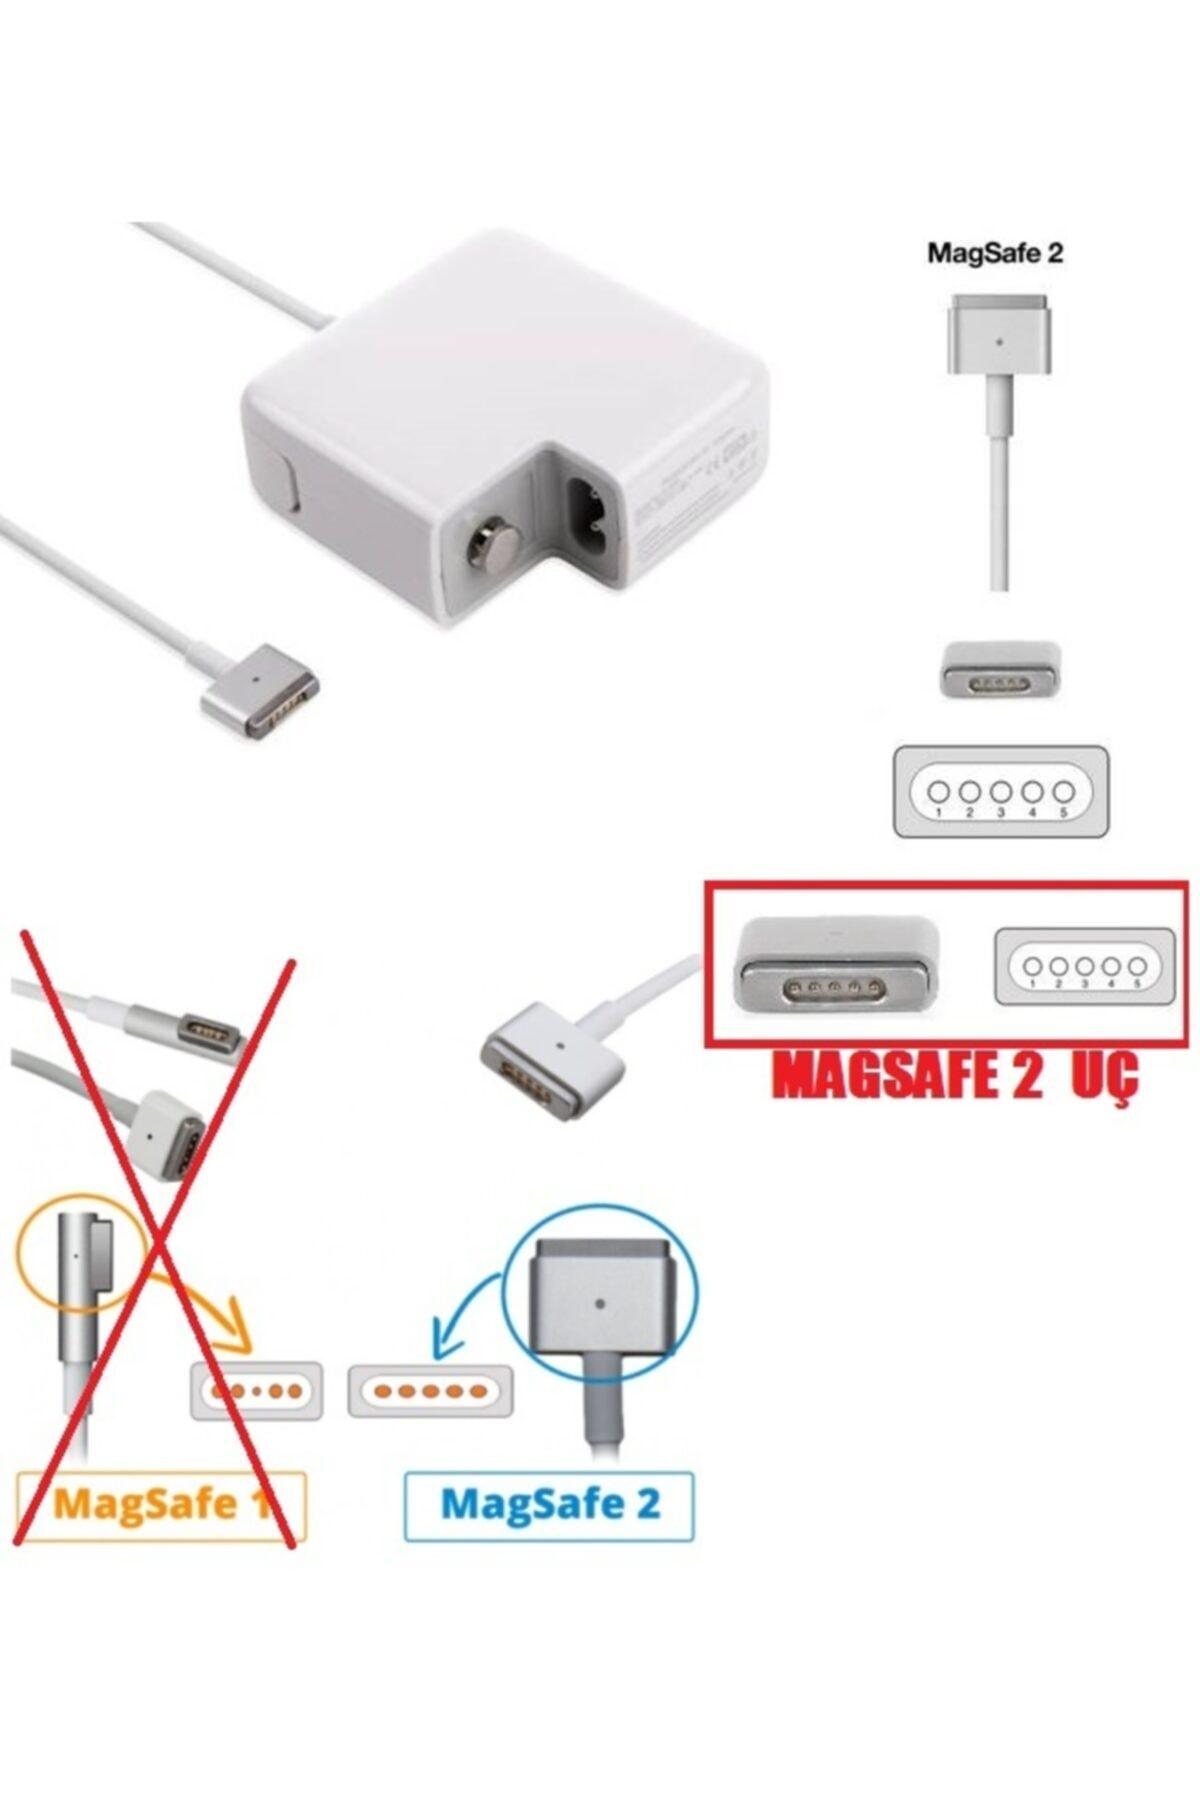 ATAELEKTRONİK Kaliteli Muadil Macbook Air (11-inch, Önce 2015) 14.85v 3.05a 45w Magsafe 2 Güç Adaptörü Şarj Cihazı 2